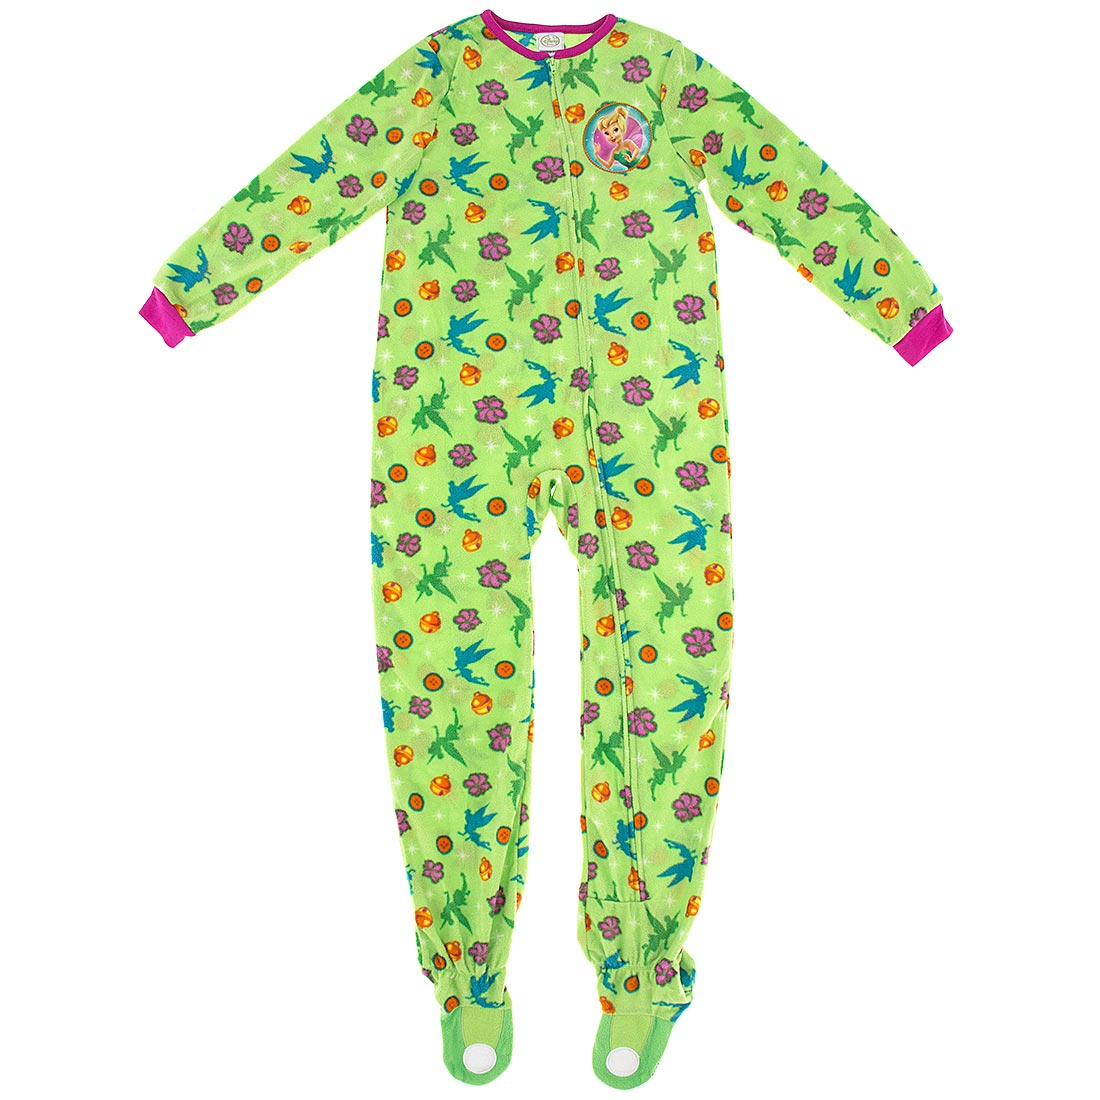 1100x1100 Pajama Pair Clipart Pyjamas Pencil And In Color Pair